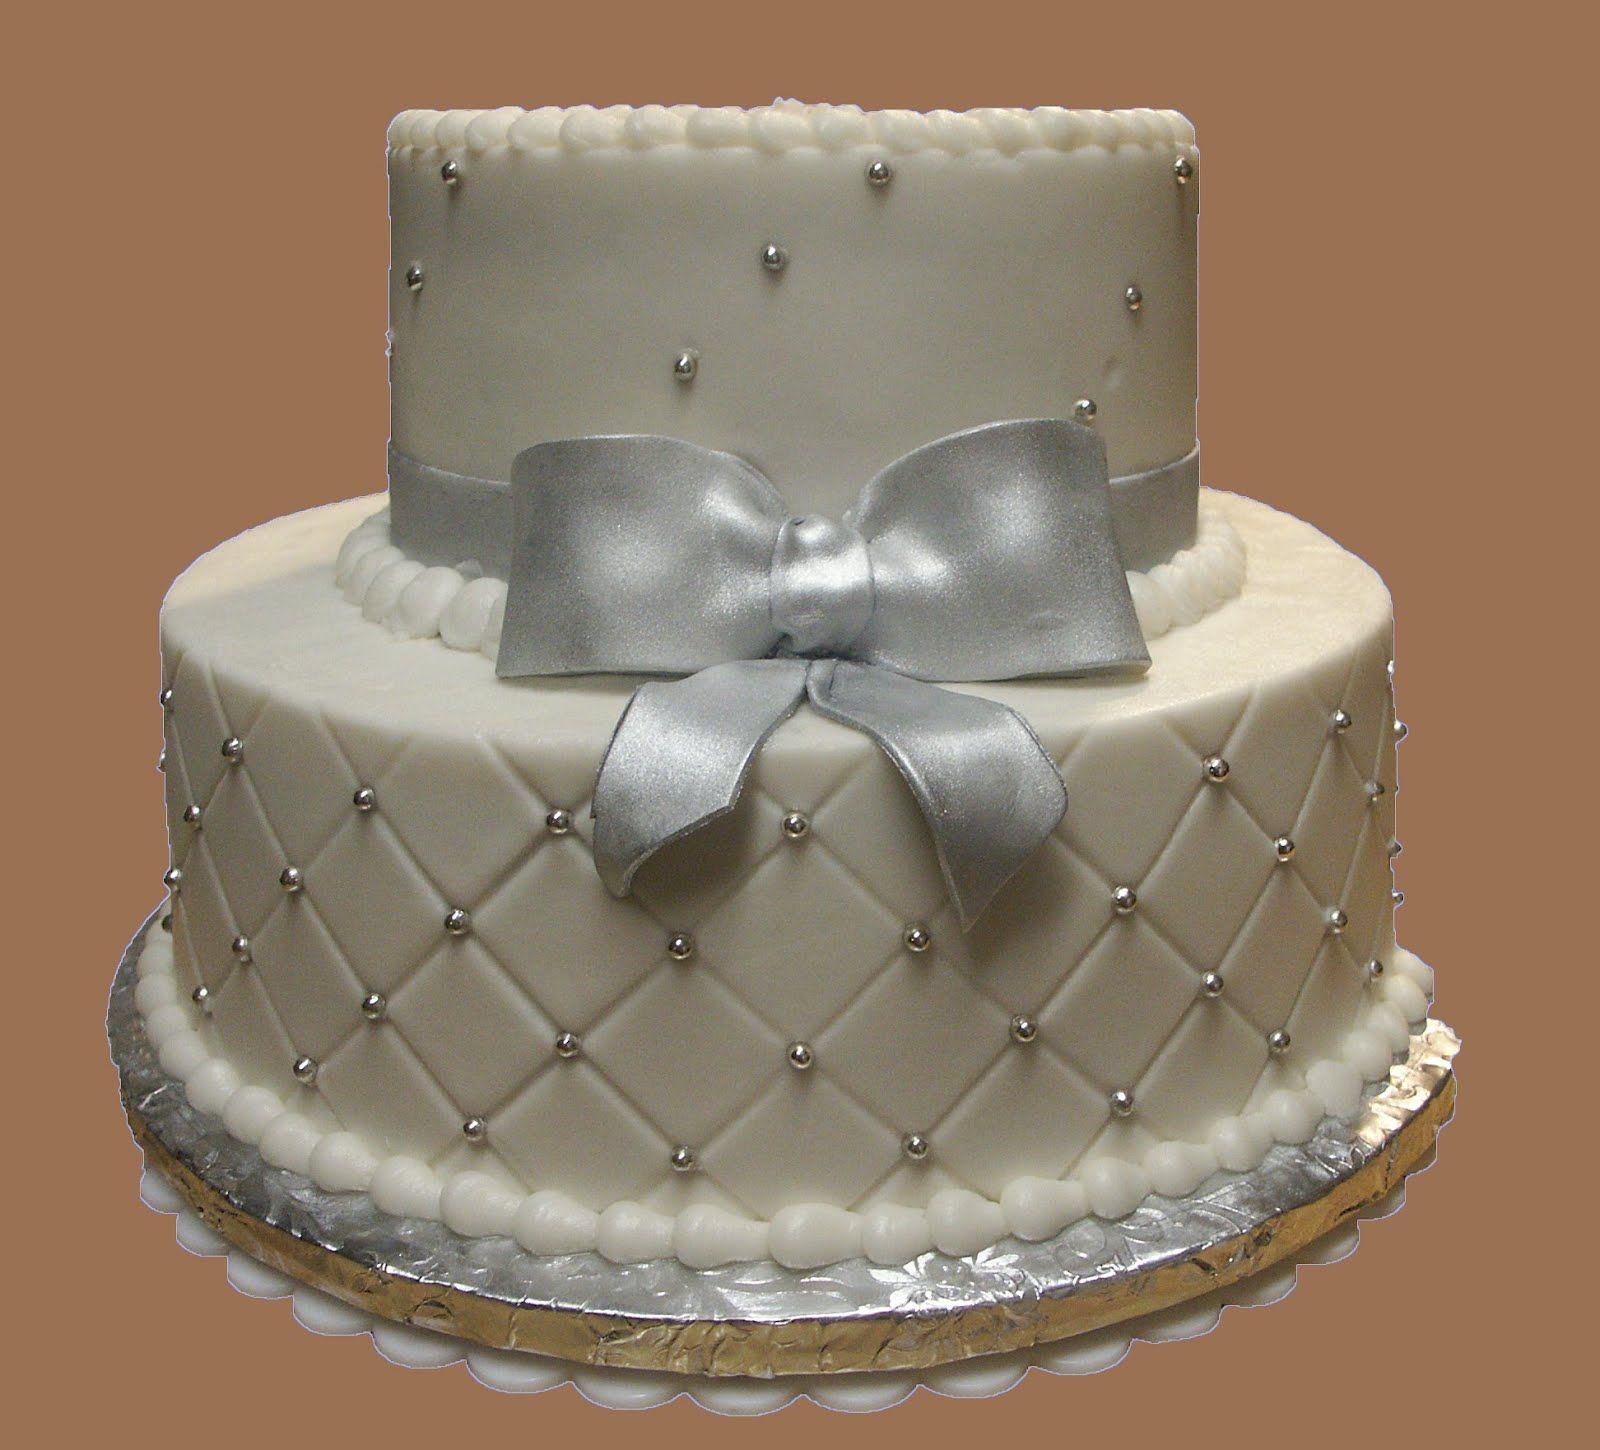 25th Wedding Anniversary Cake Ideas: 25th Wedding Anniversary Party Ideas Home